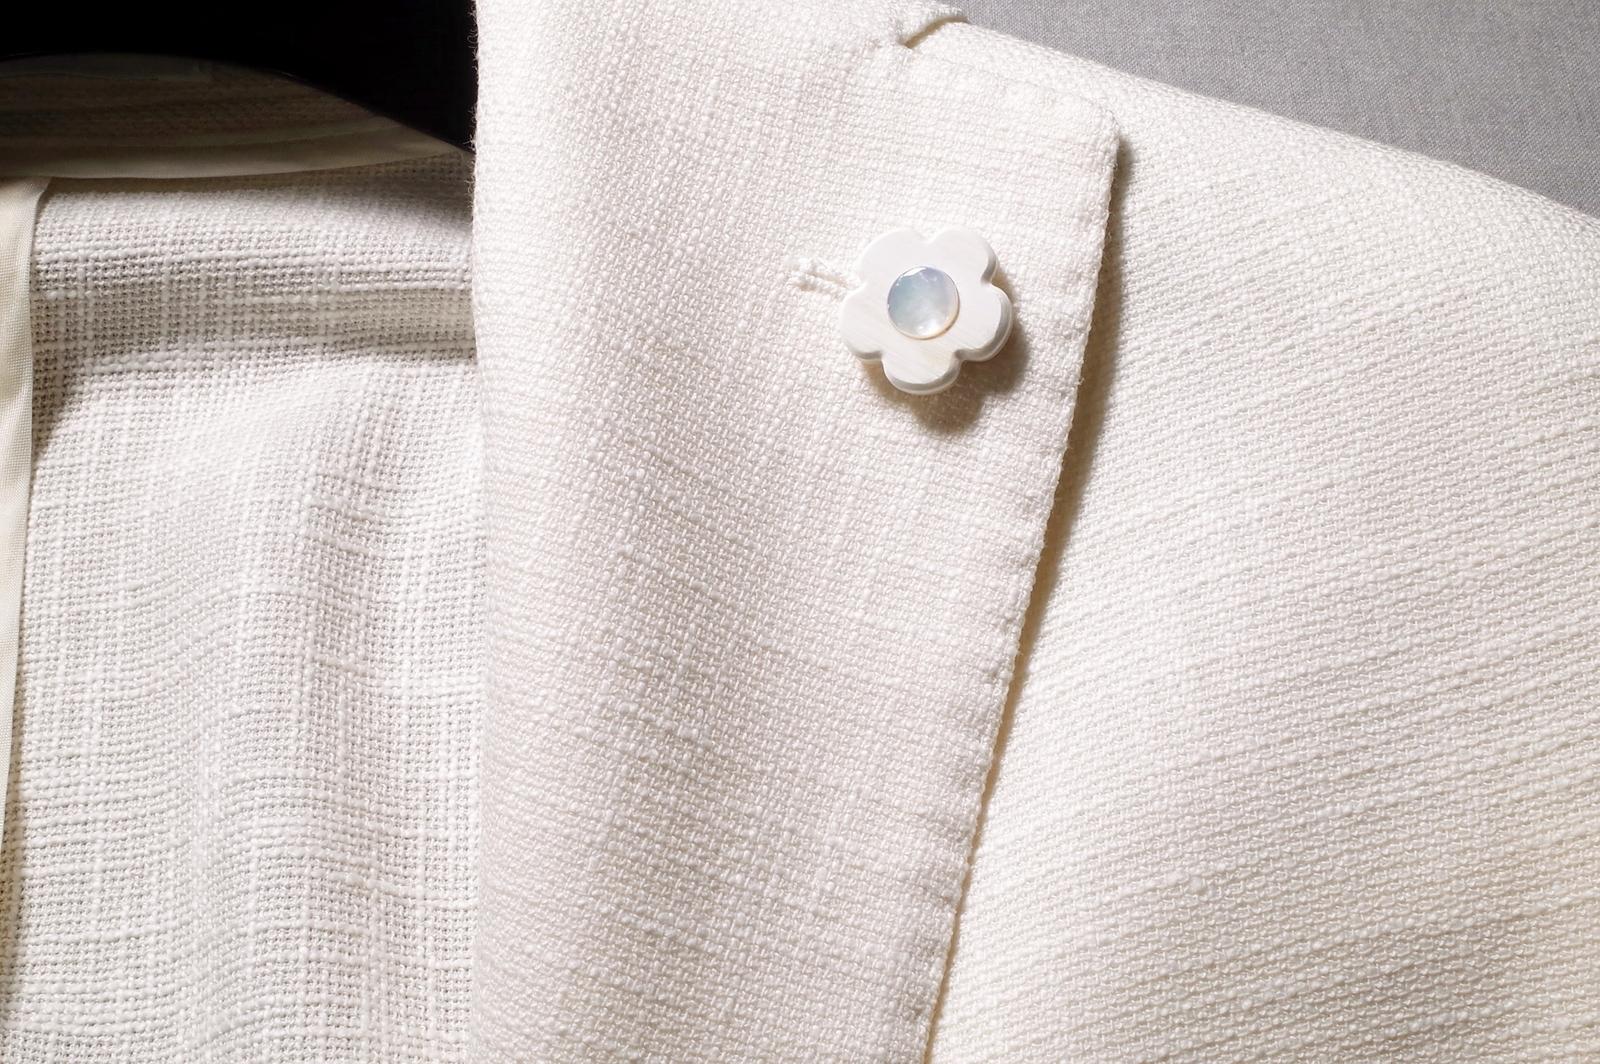 f:id:suits:20200718225546j:plain